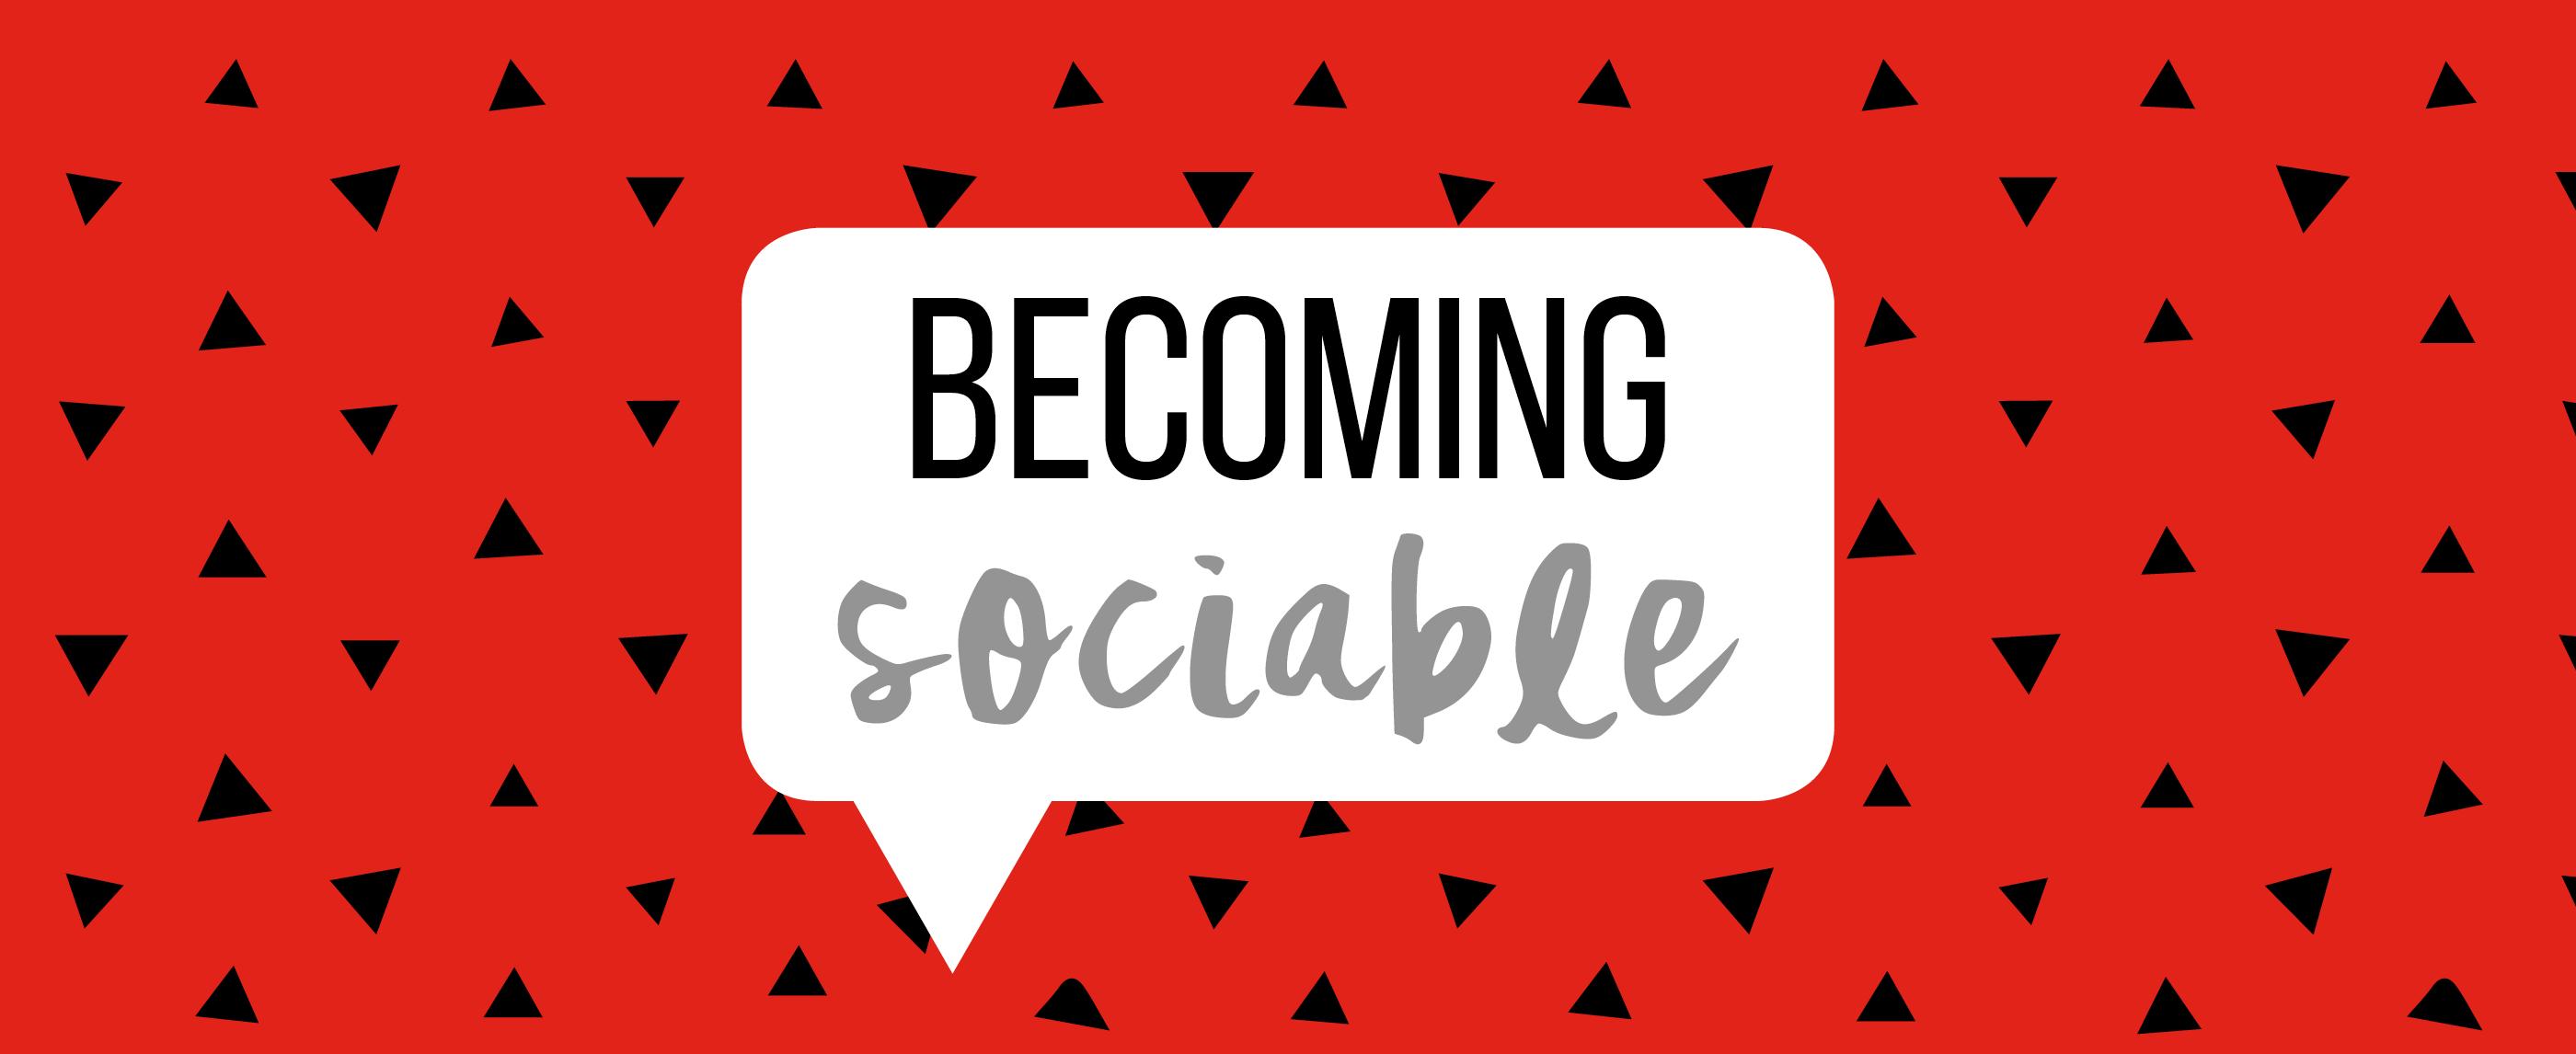 social-media-blog-featured